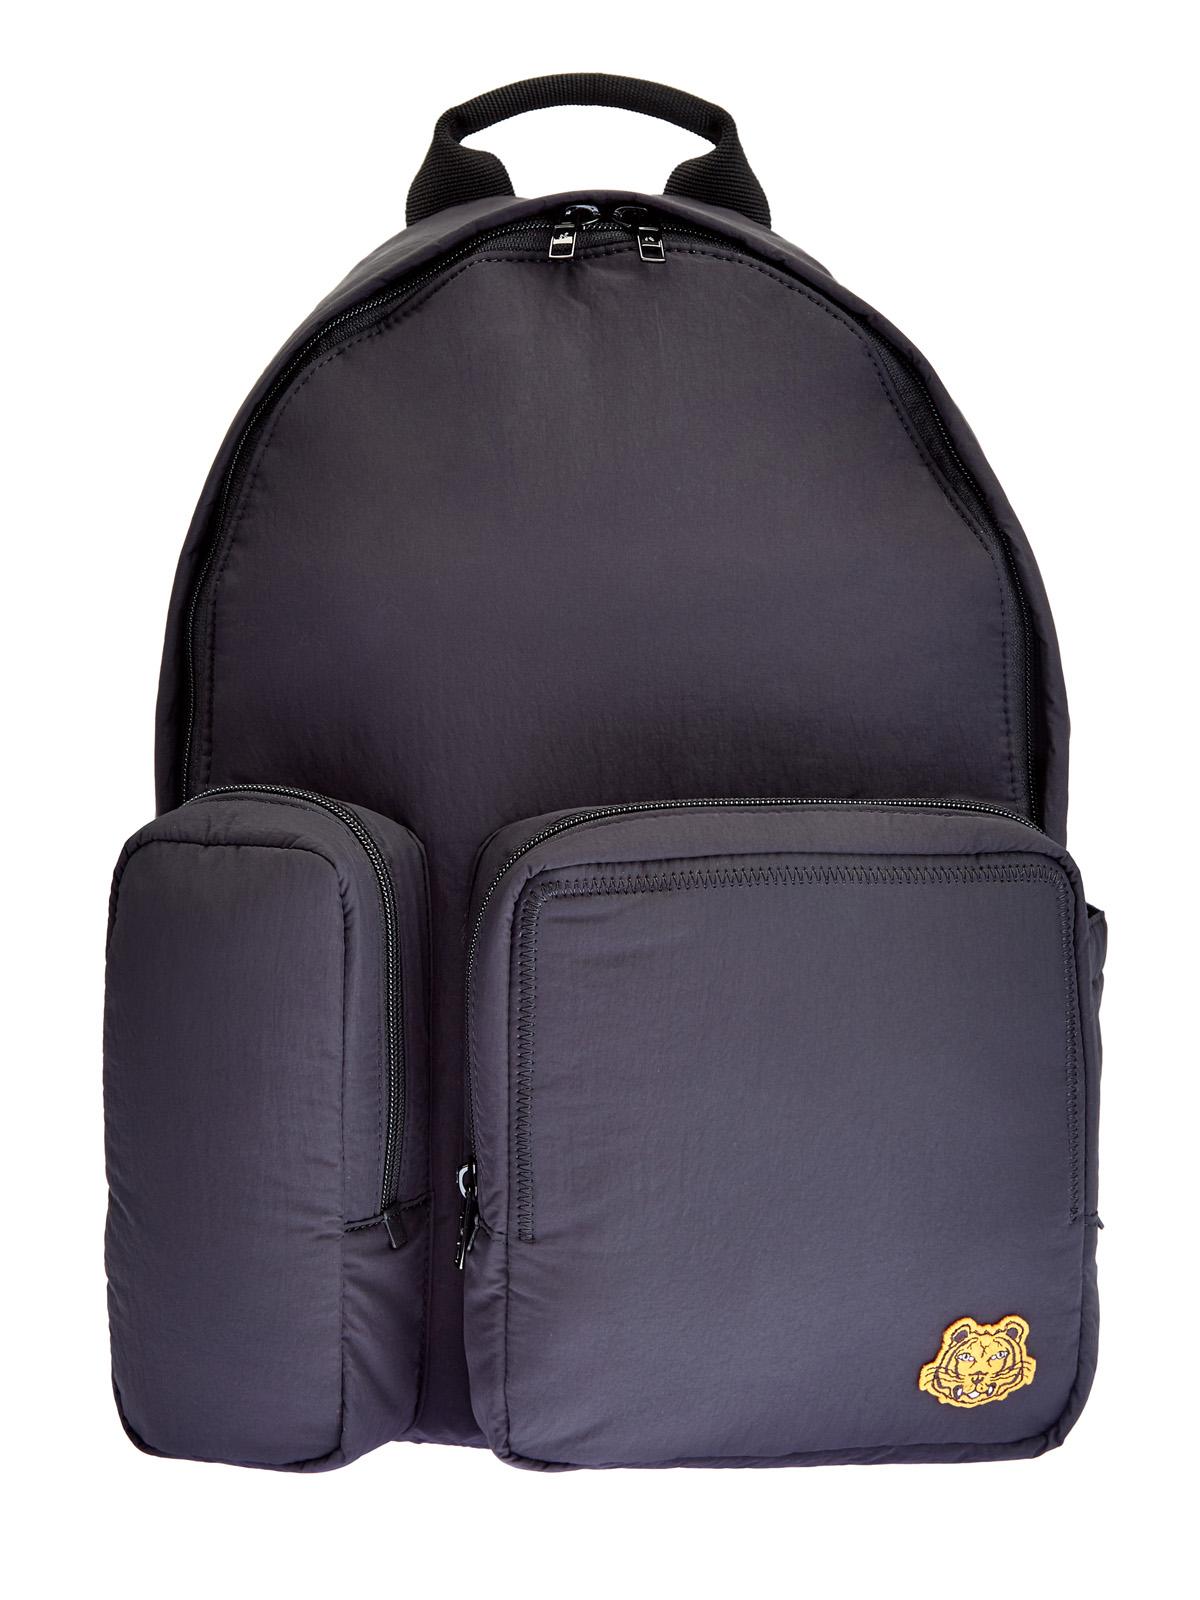 Рюкзак из нейлона с асимметричными карманами